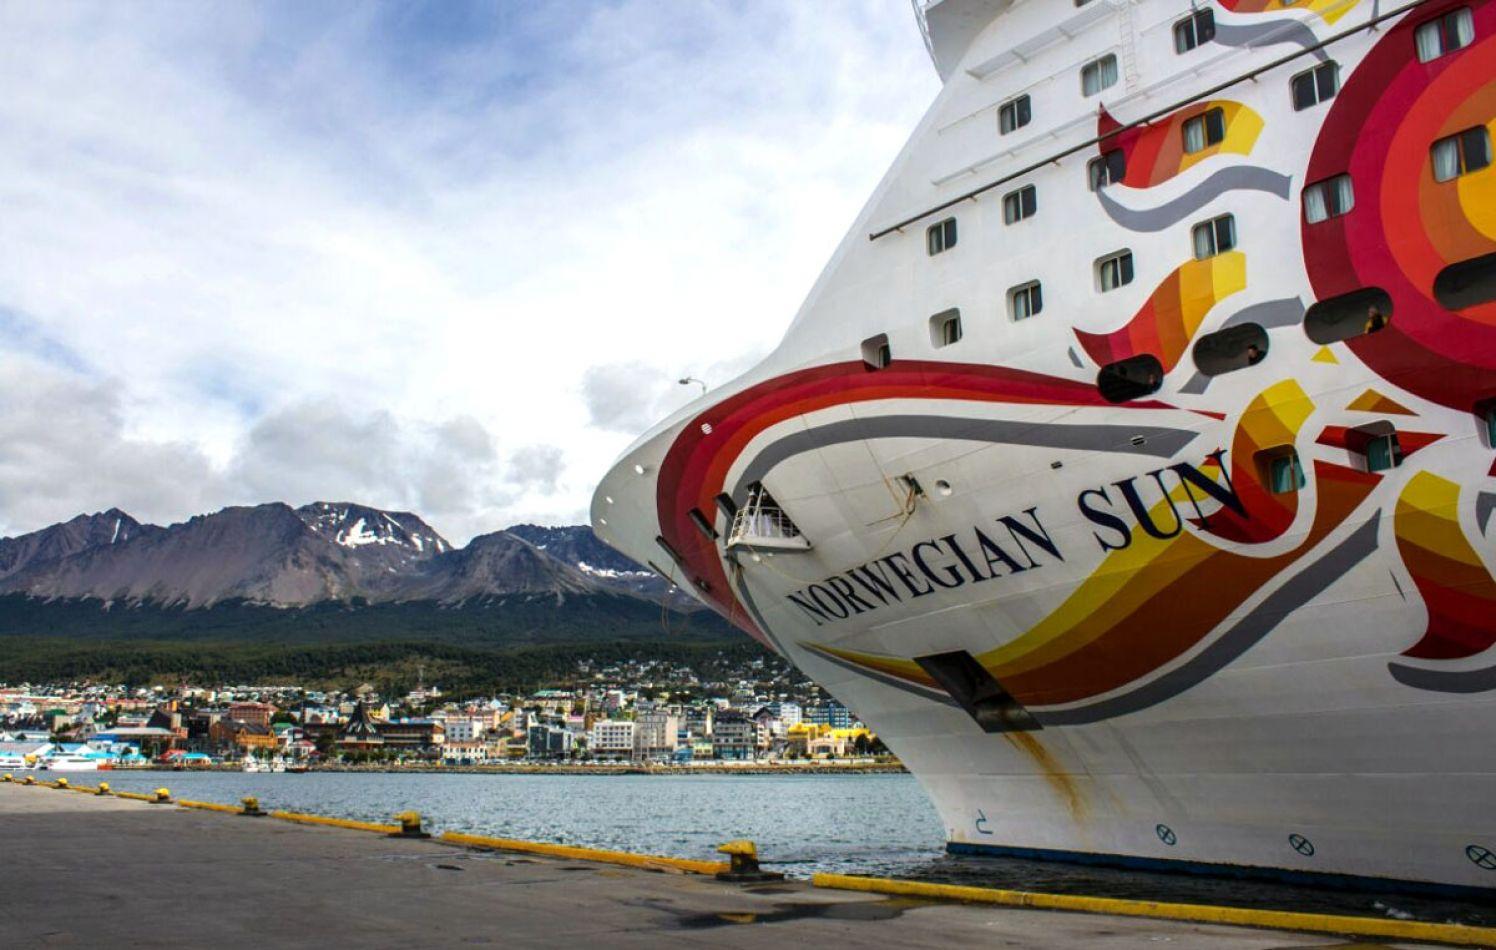 Nowergian Cruise ya vende pasajes para viajar a la Antártida.